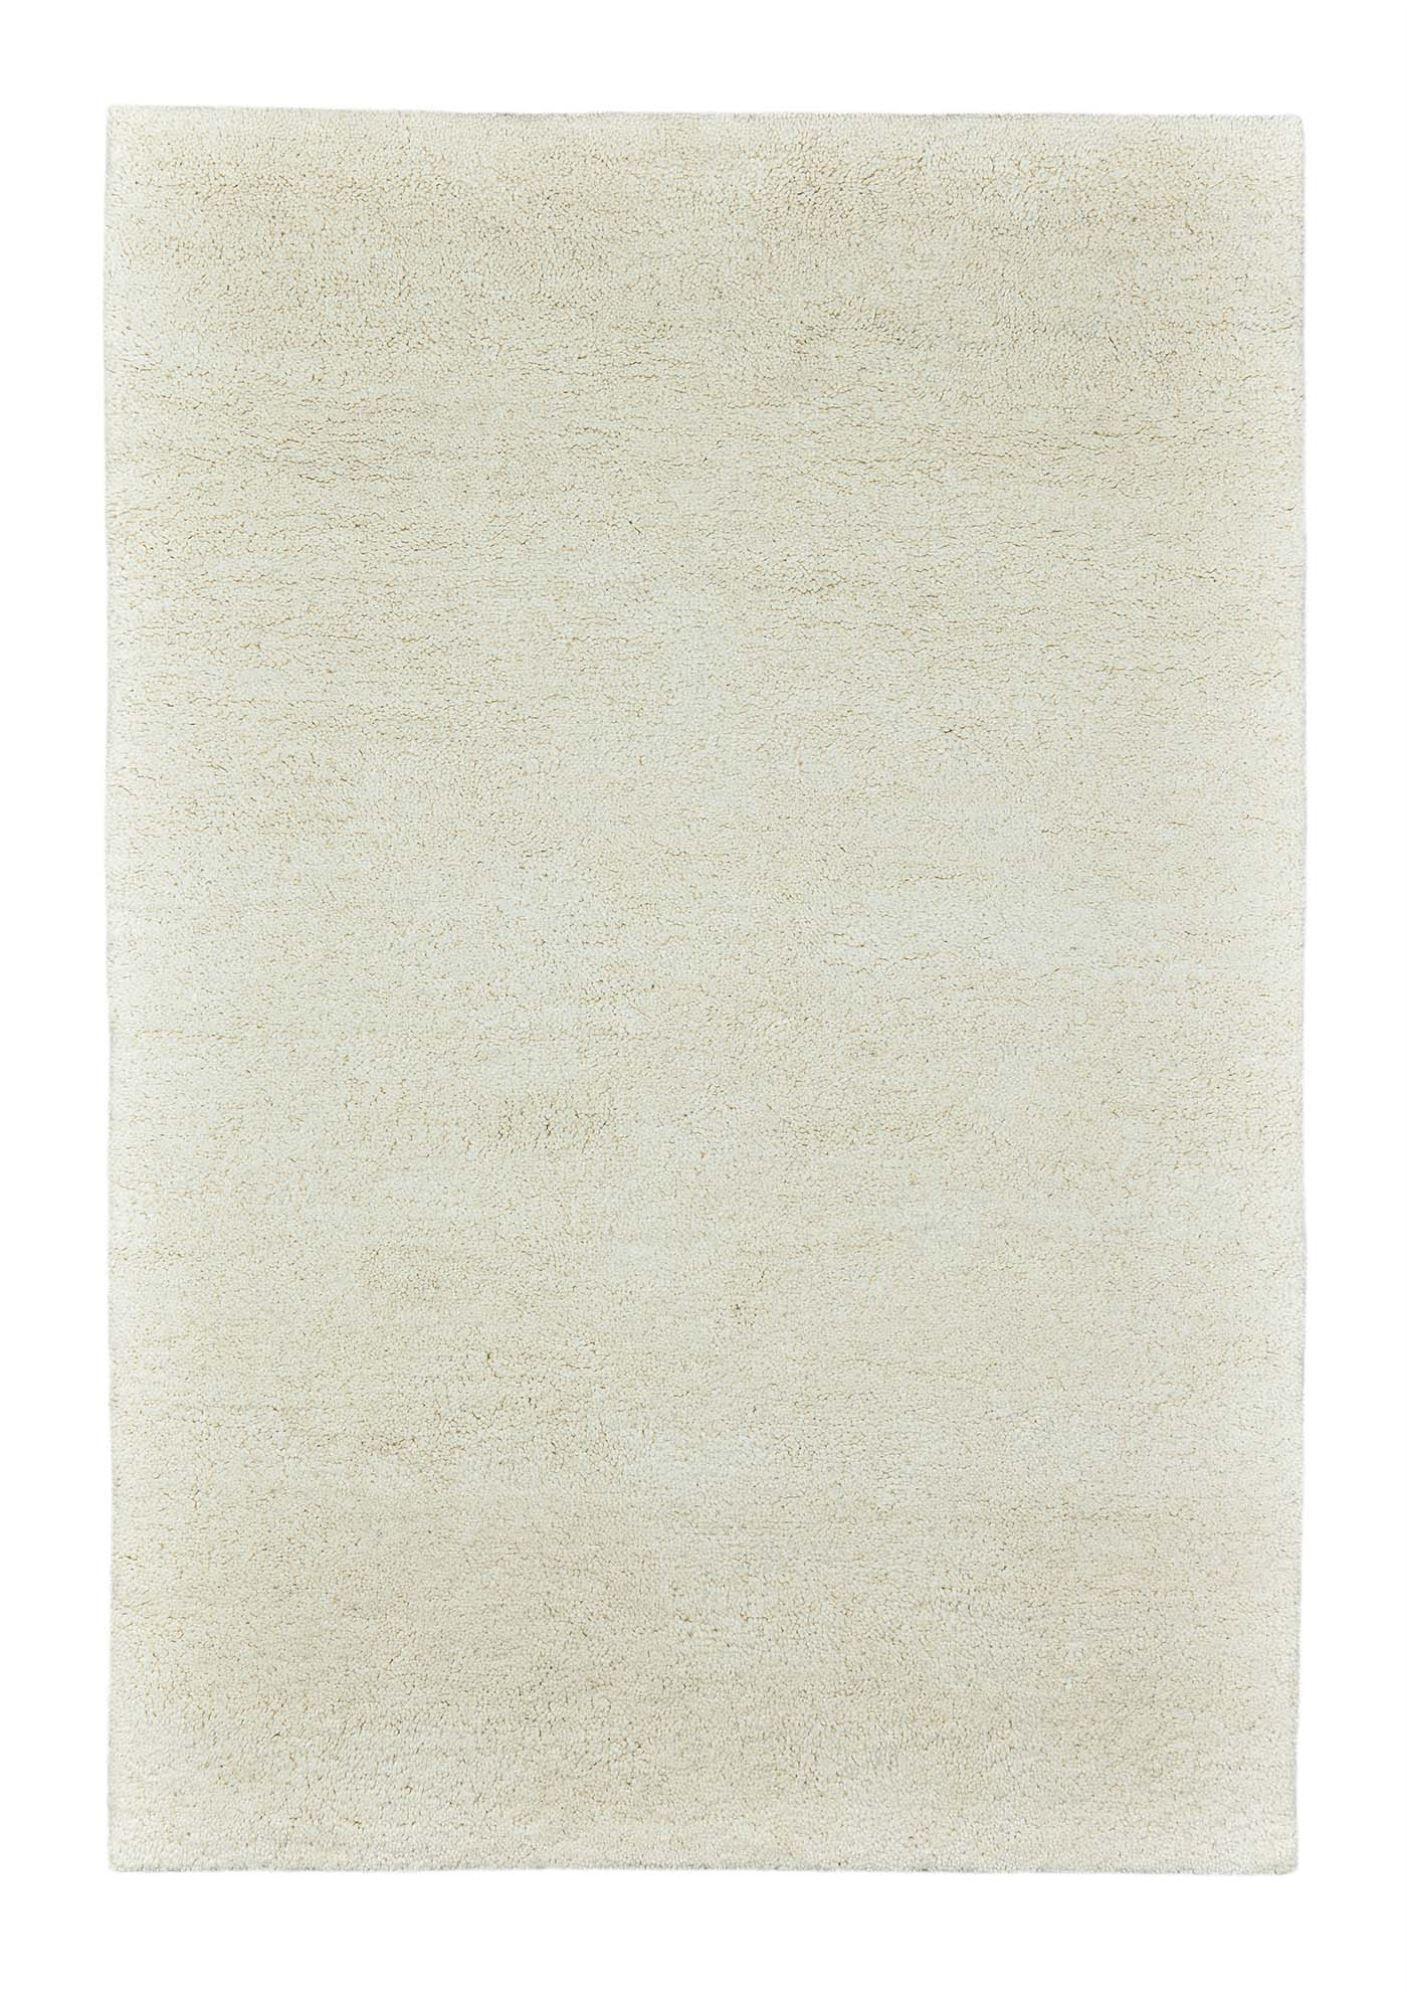 THEKO Tapis berber du maroc en laine naturelle Blanc 70x140